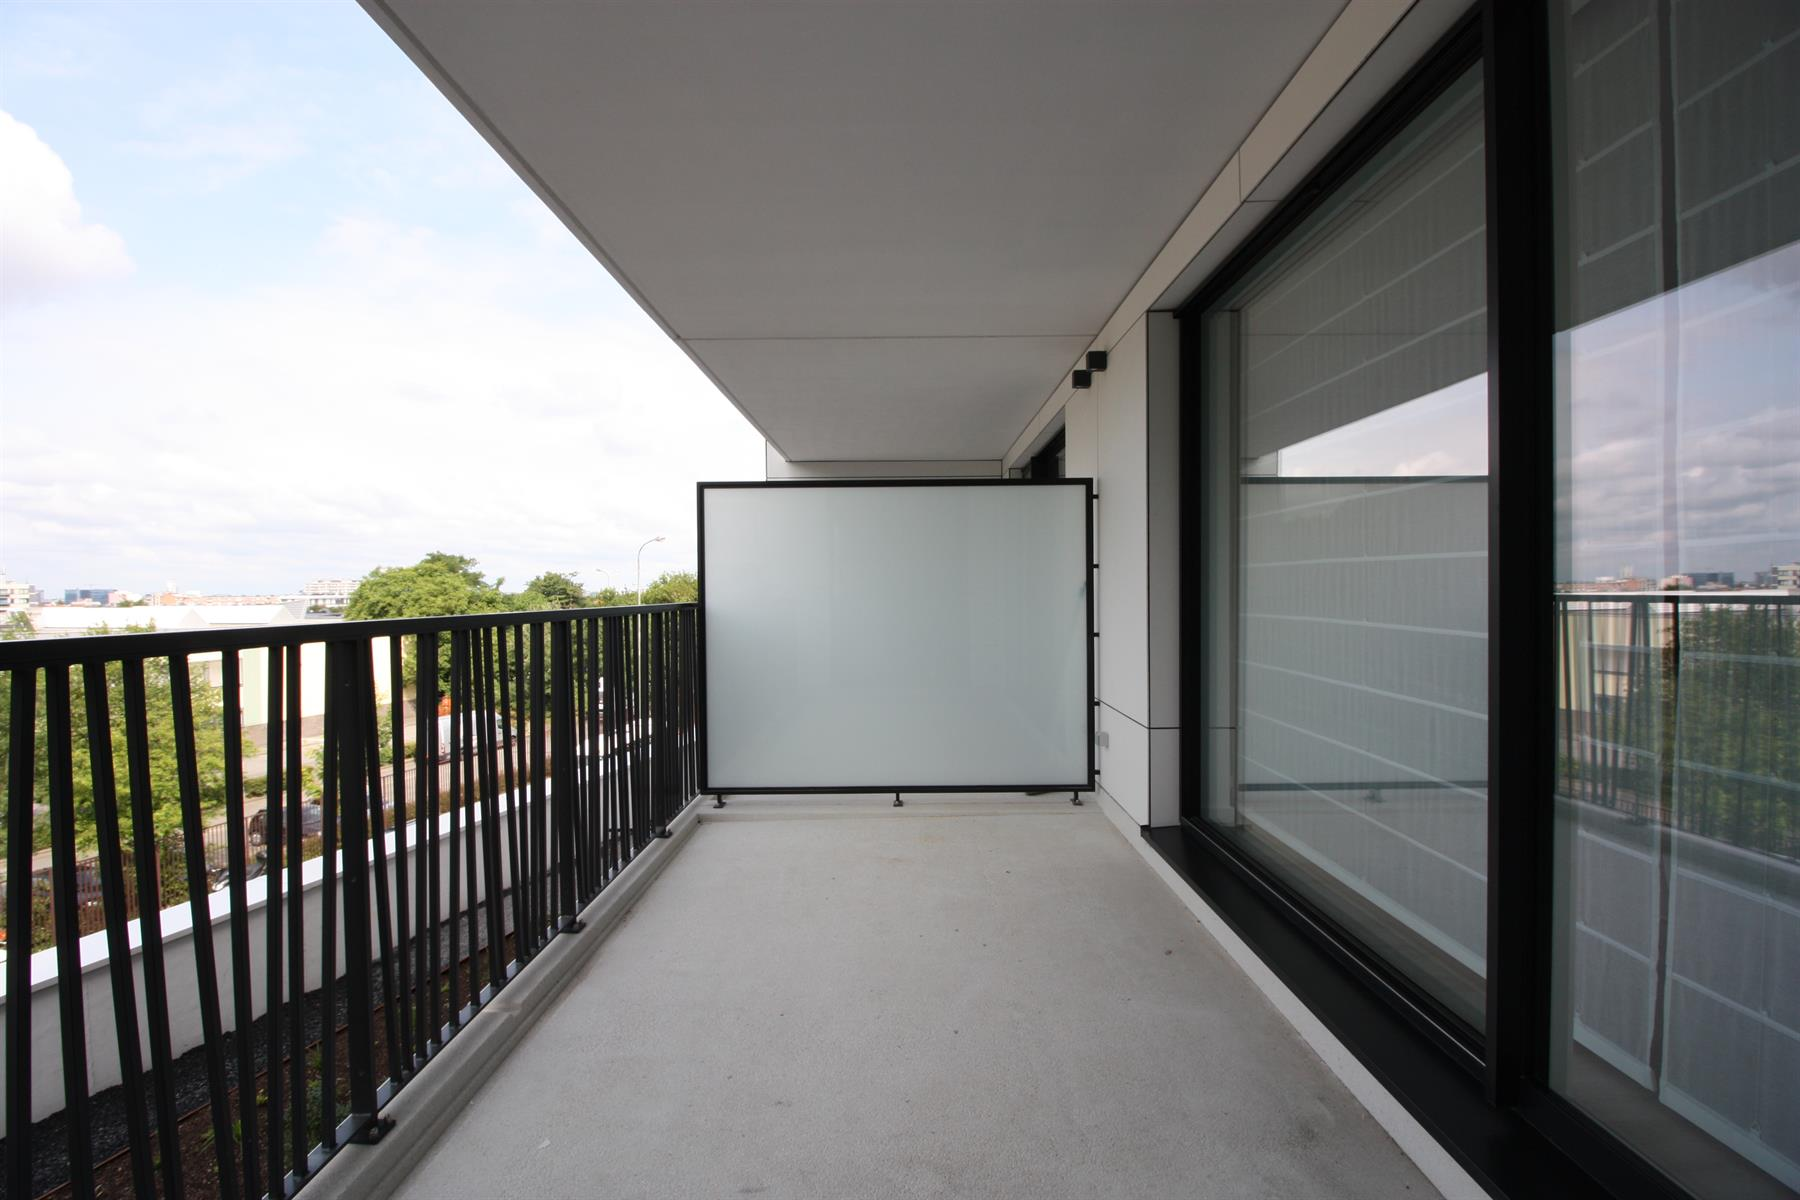 Appartement - Woluwe-Saint-Lambert - #4395355-10